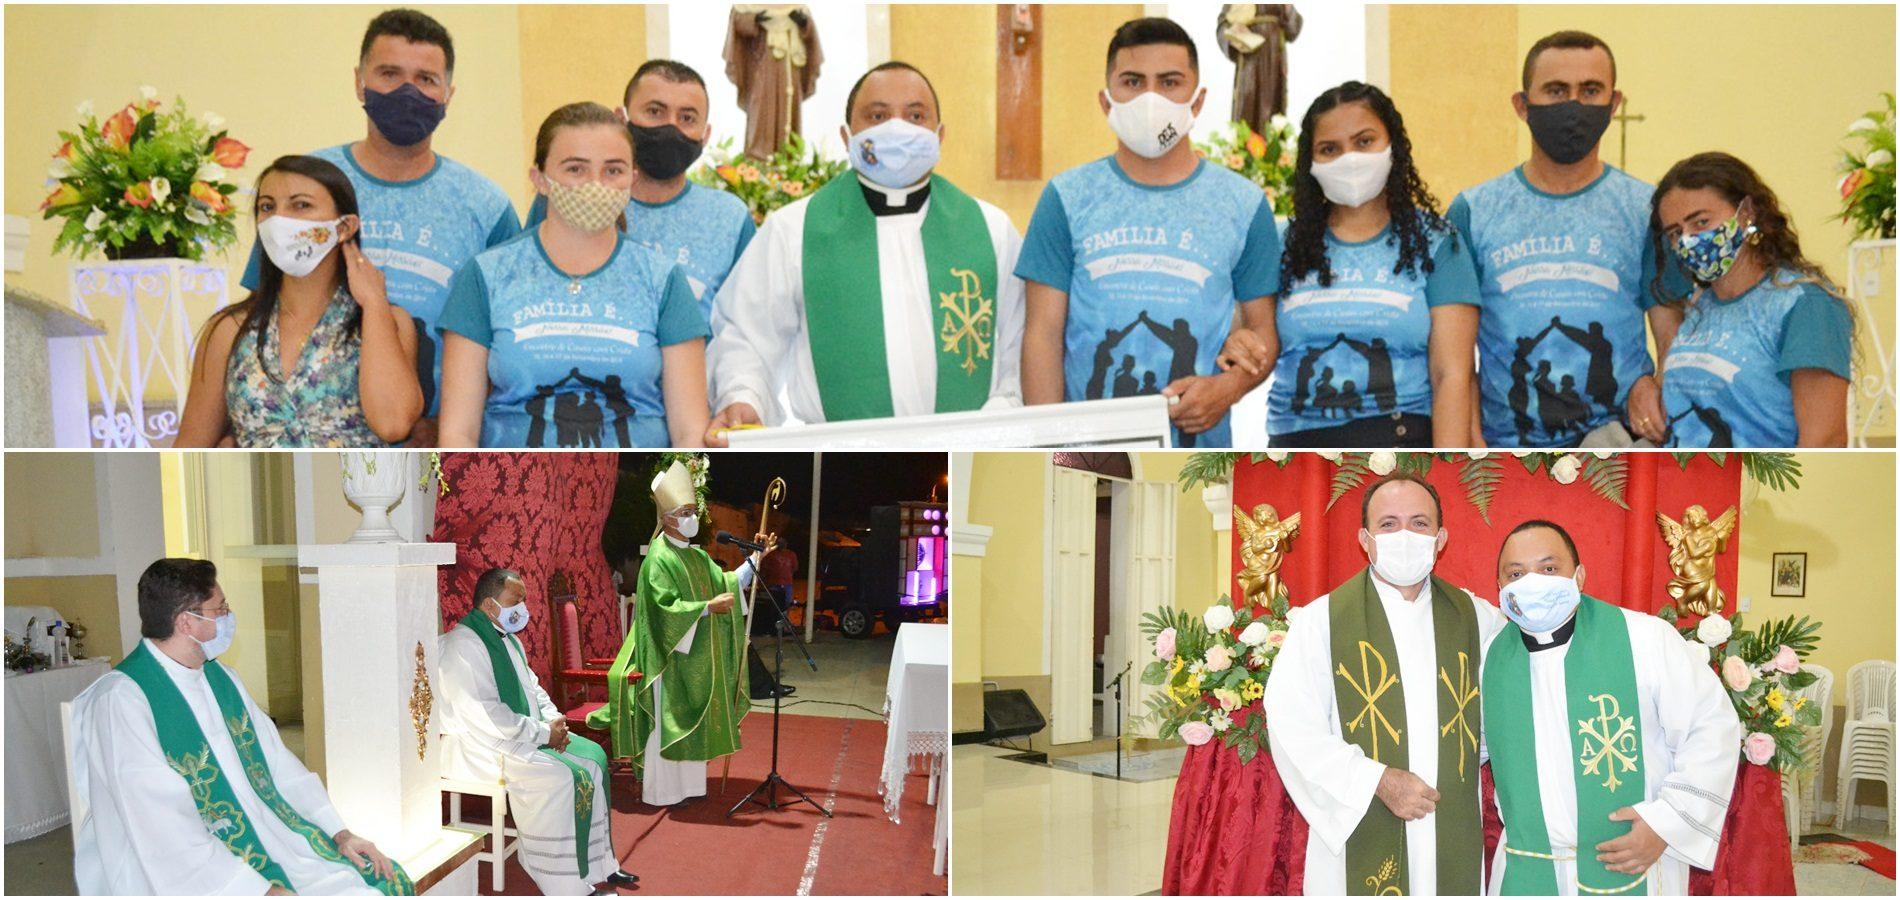 Padre Vanderlan Silva será Vigário Paroquial no município de Padre Marcos